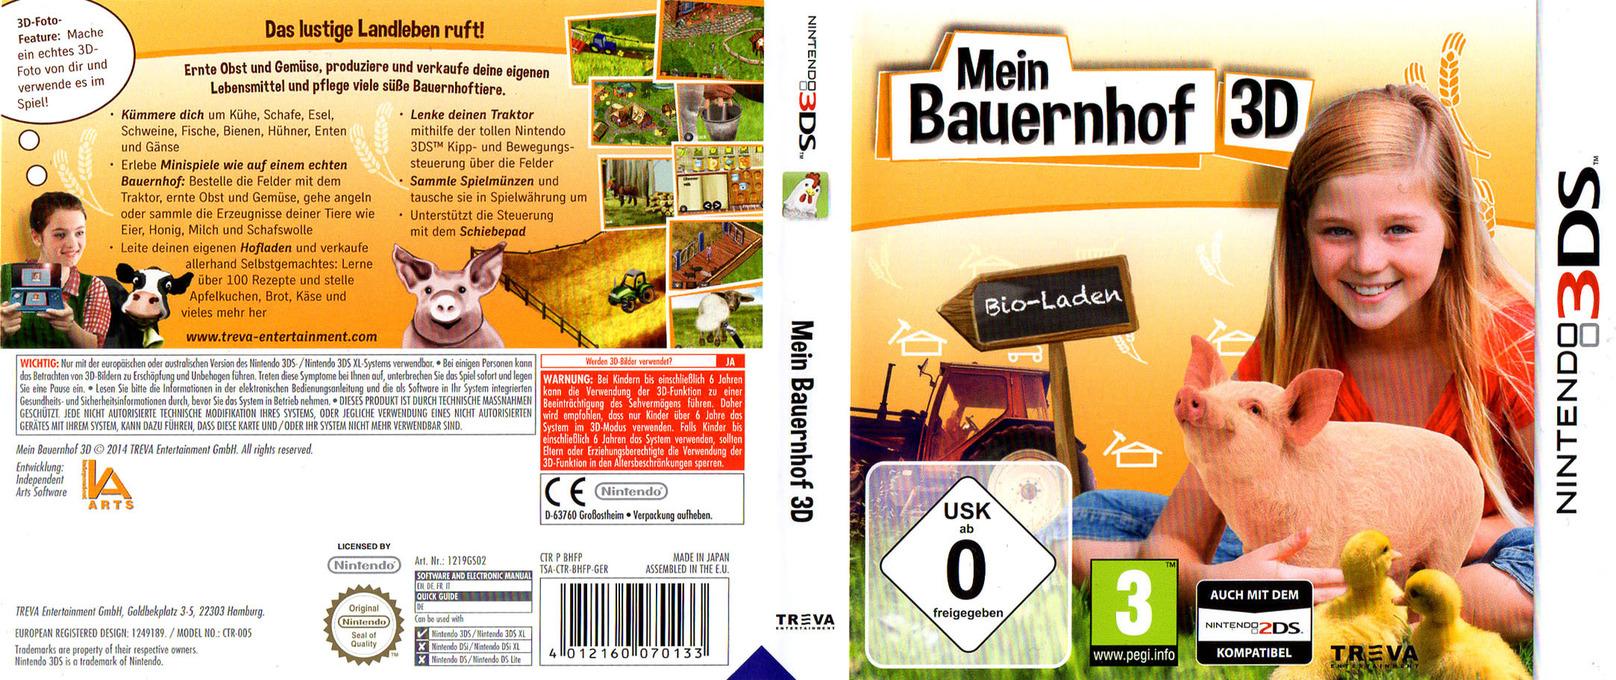 Mein Bauernhof 3D 3DS coverfullHQ (BHFP)